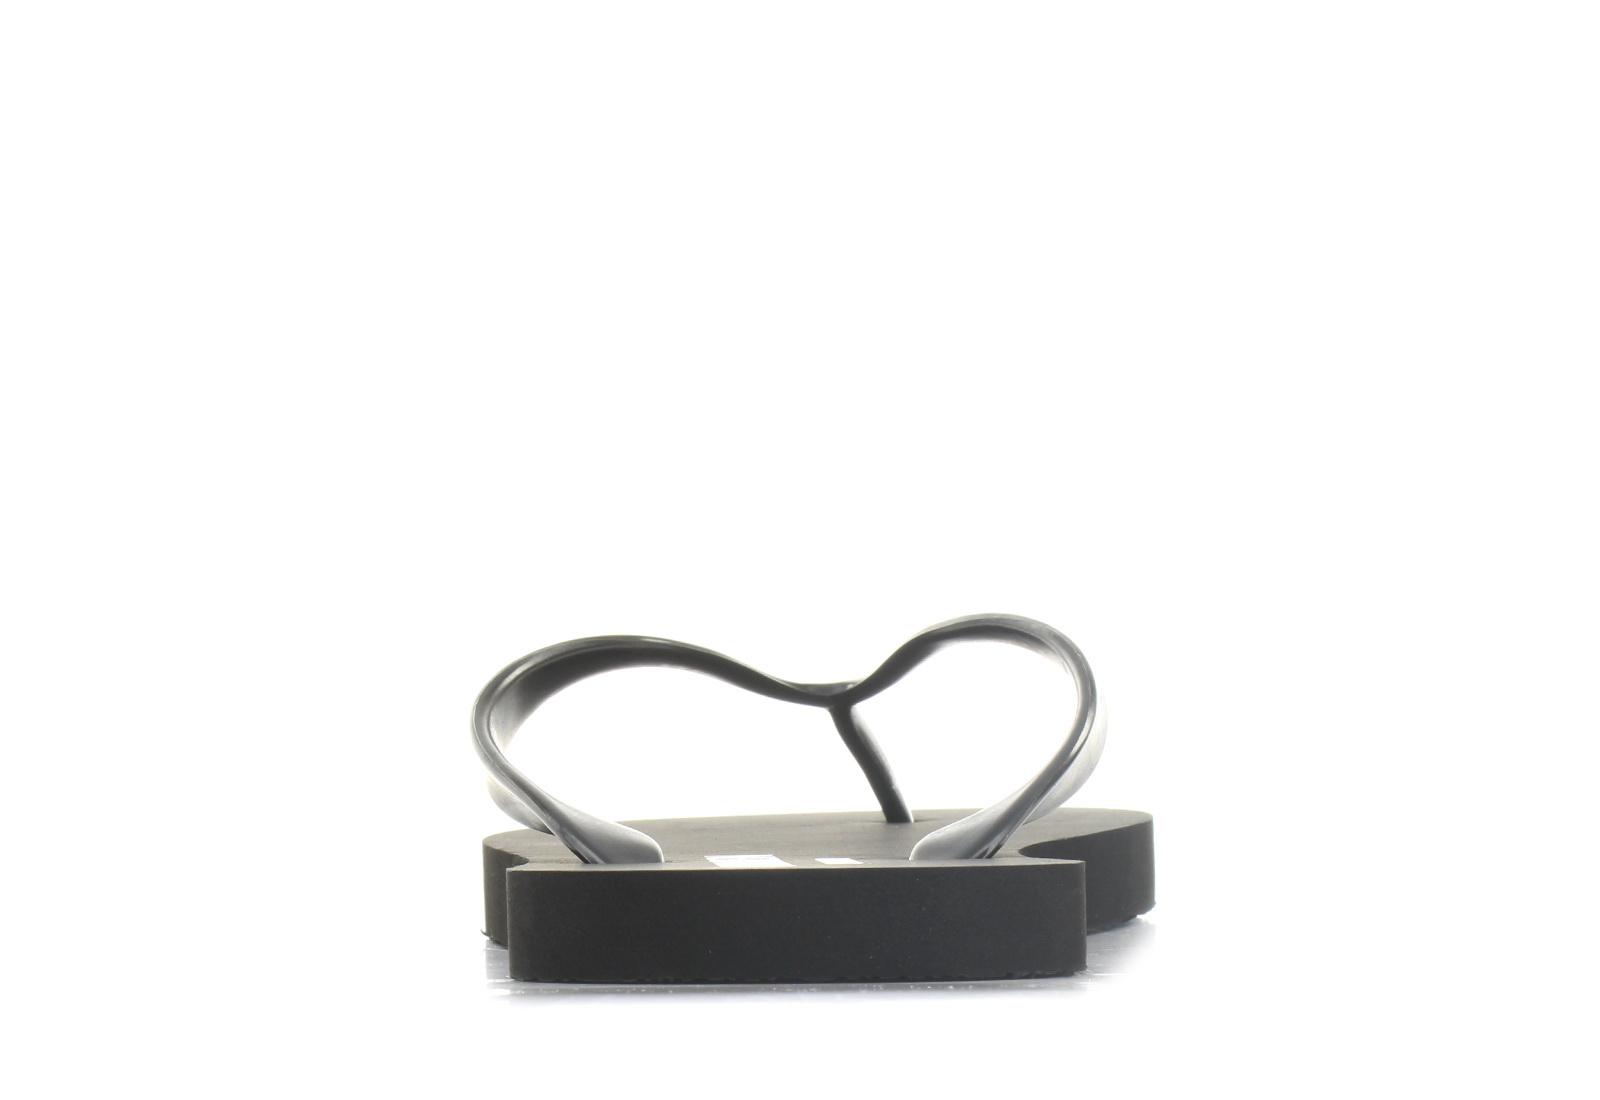 85e7e0f2d5 Calvin Klein Swimwear Šľapky - Core Lifestyle Sandal - KM00341-001 ...